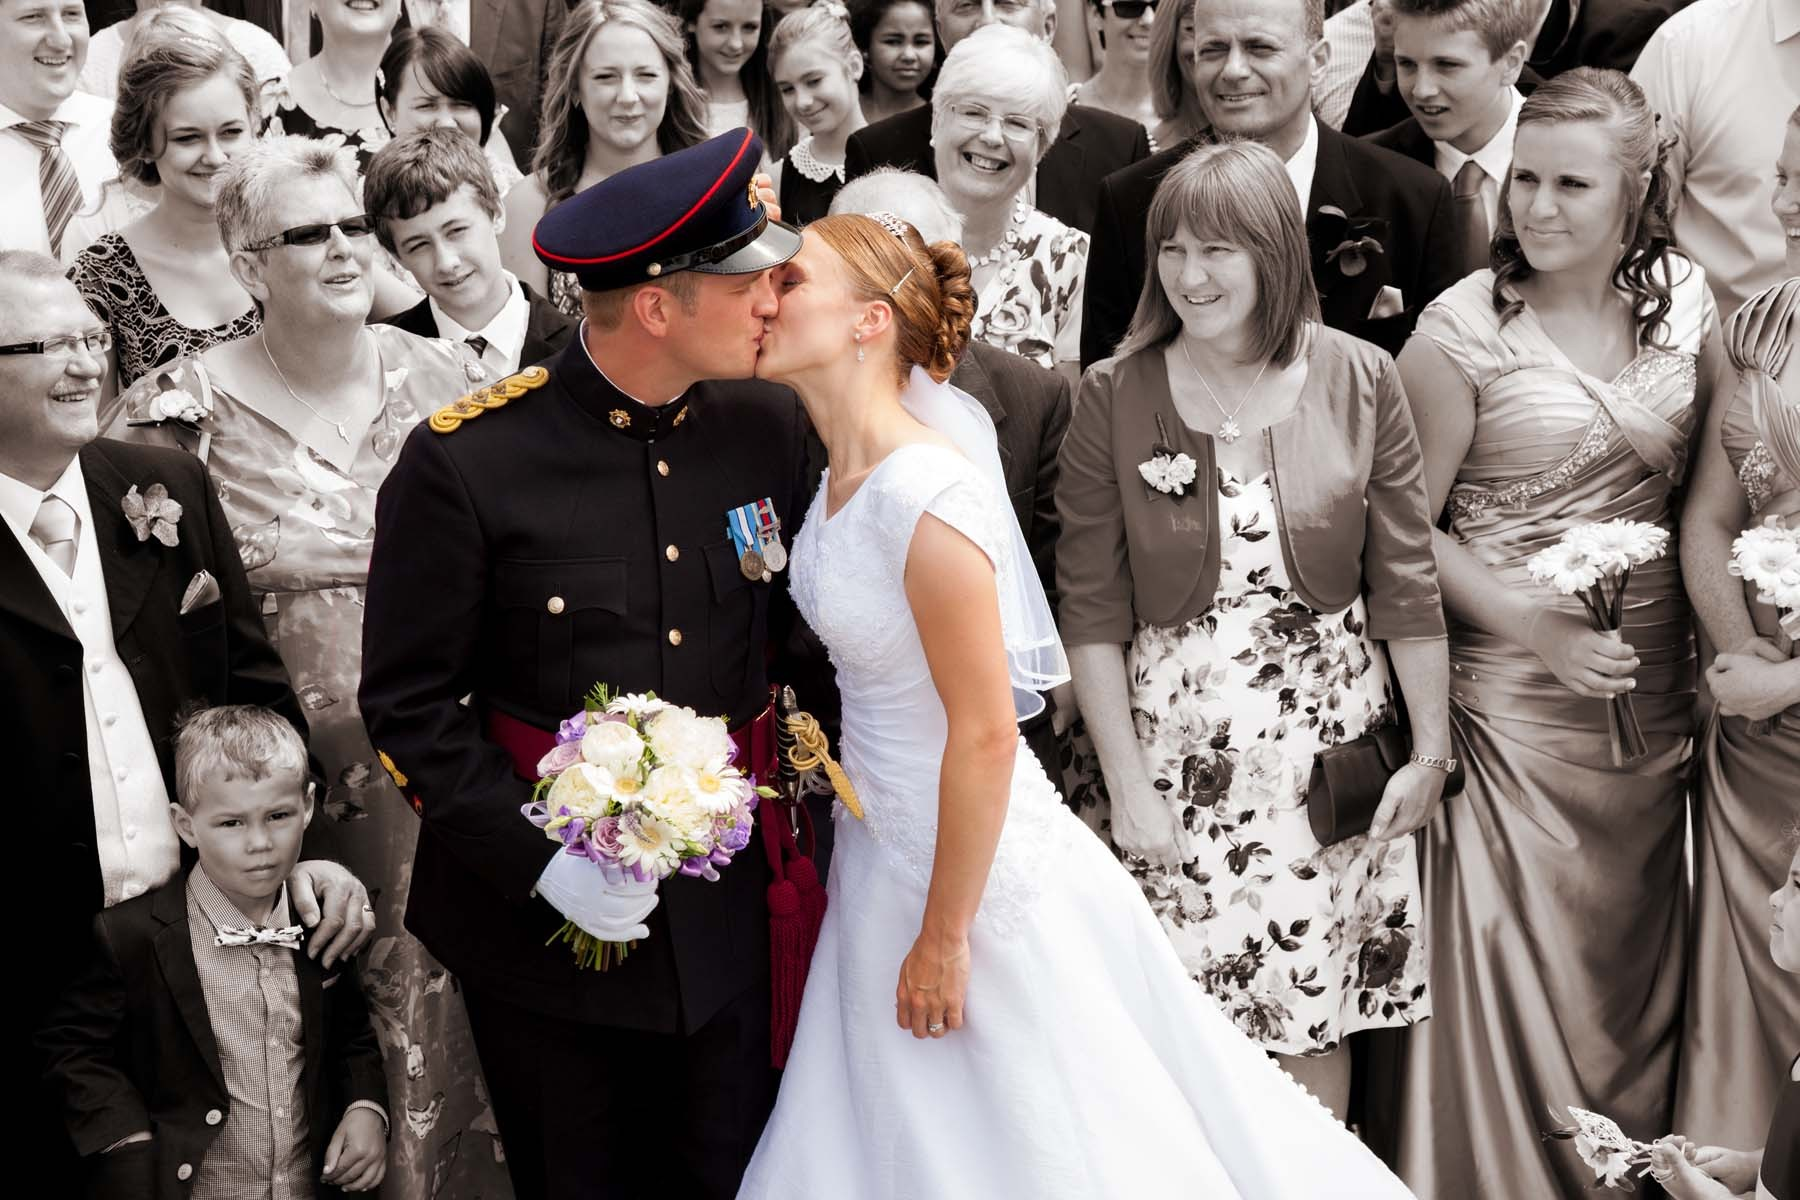 Sussex & Surrey Wedding Photographer - Guests & Groups (3)